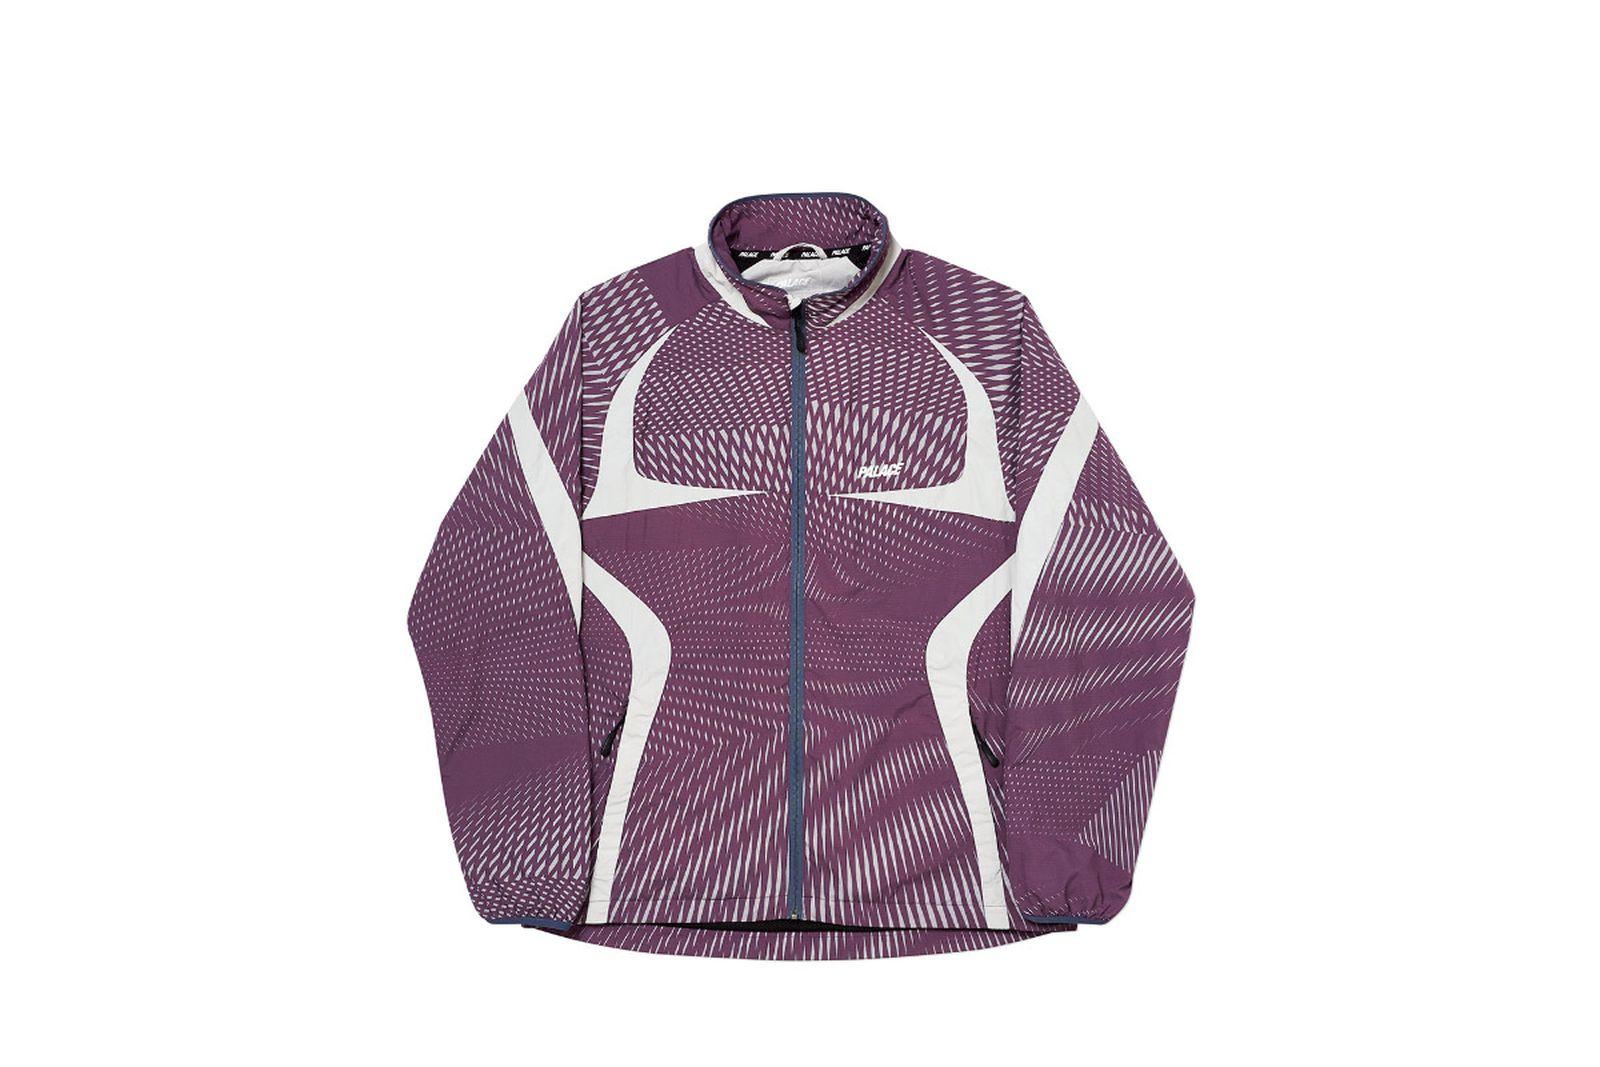 Palace 2019 Autumn Jacket Dazzler Shell plum grey front